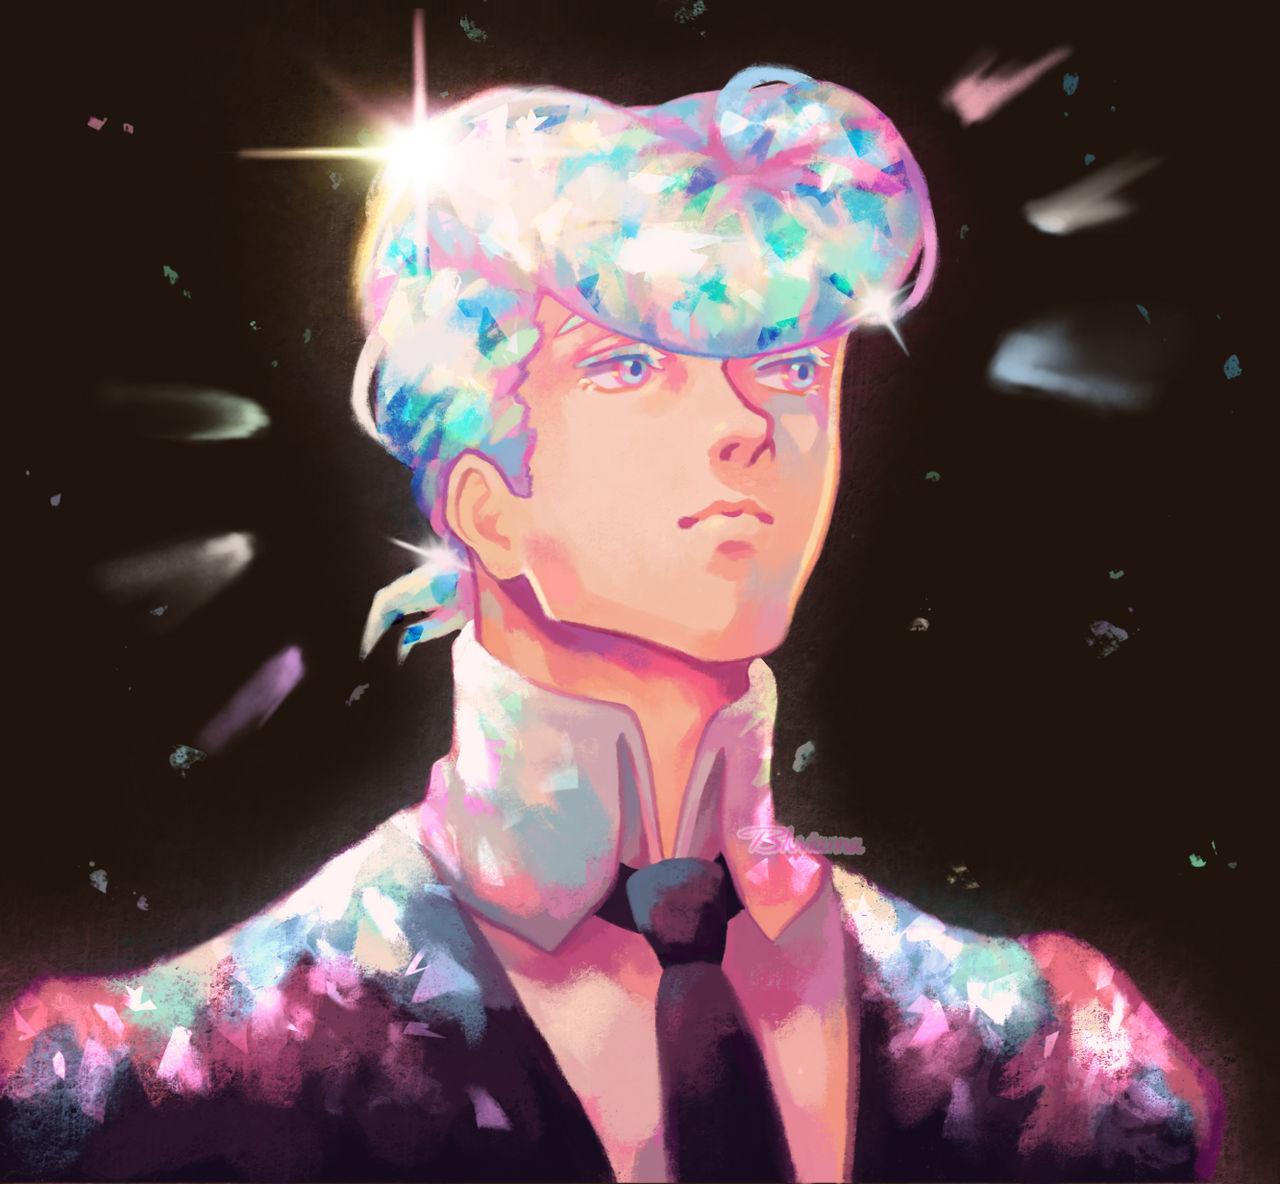 Shine On You Crazy Diamond By Bluvianna On Deviantart Crazy diamond theme — jojo's ost. shine on you crazy diamond by bluvianna